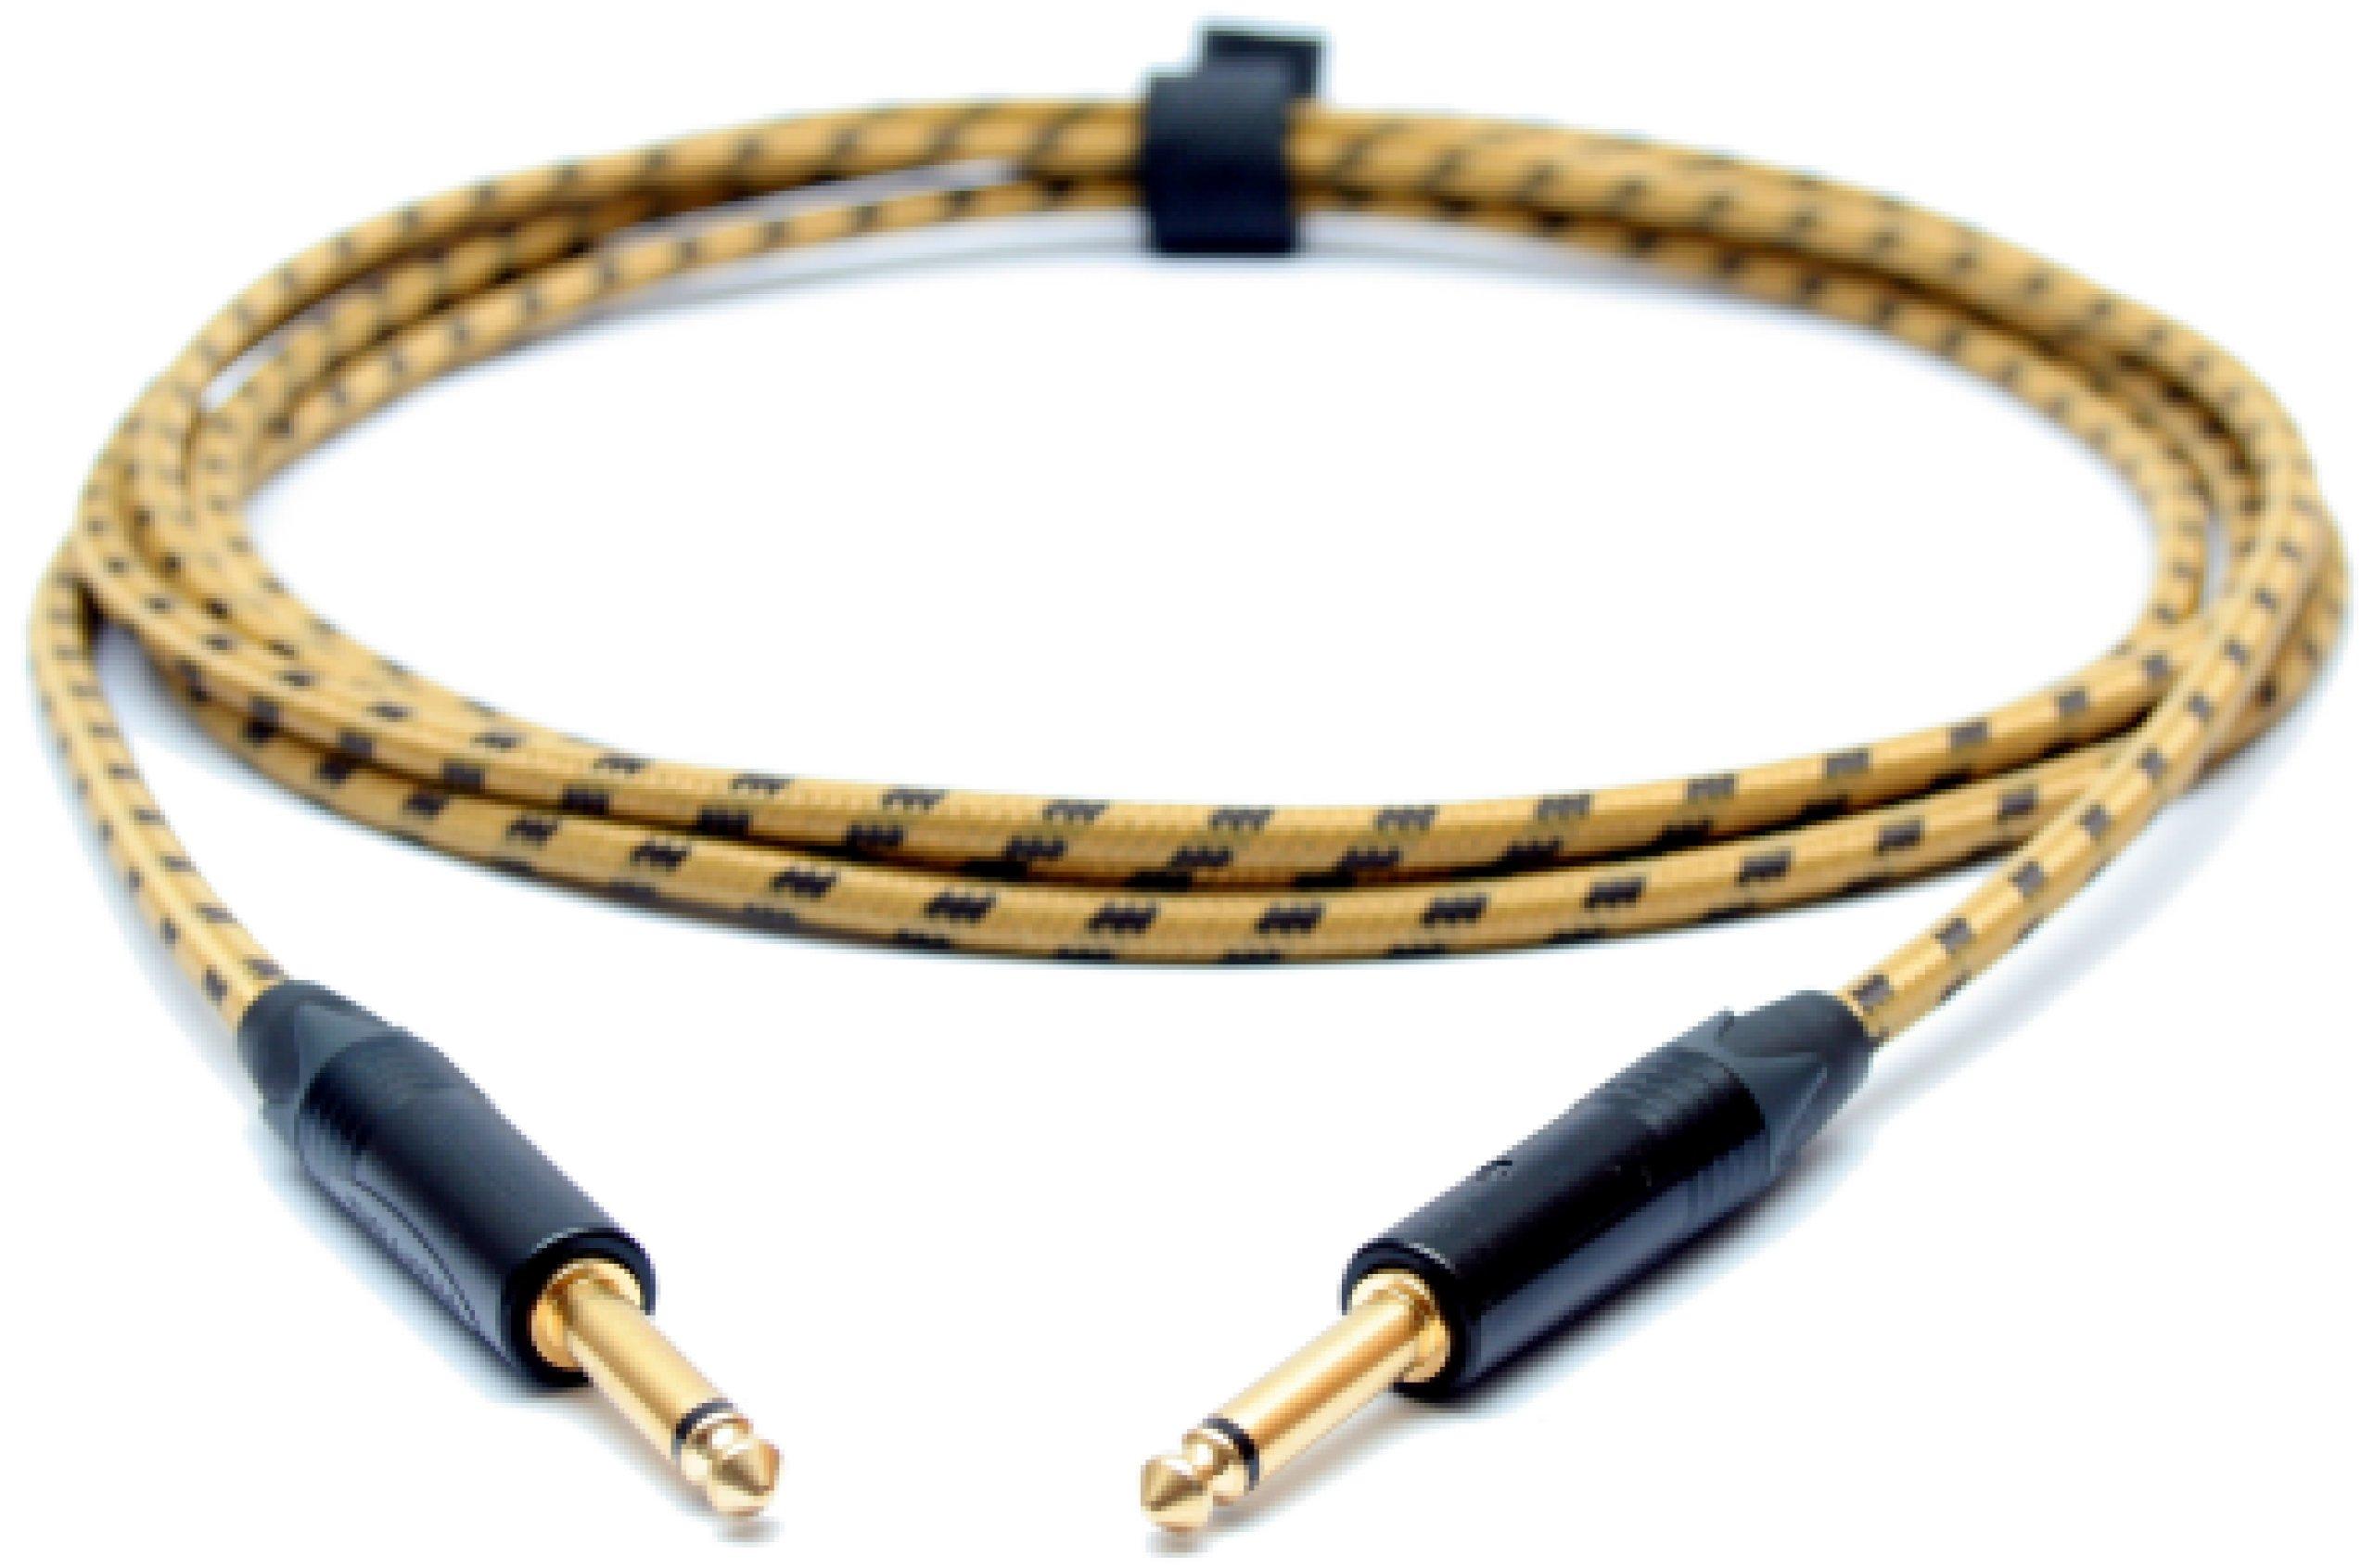 SOUNDSTAGE Kábel 5M GITARA KÁBEL vintage TWEED